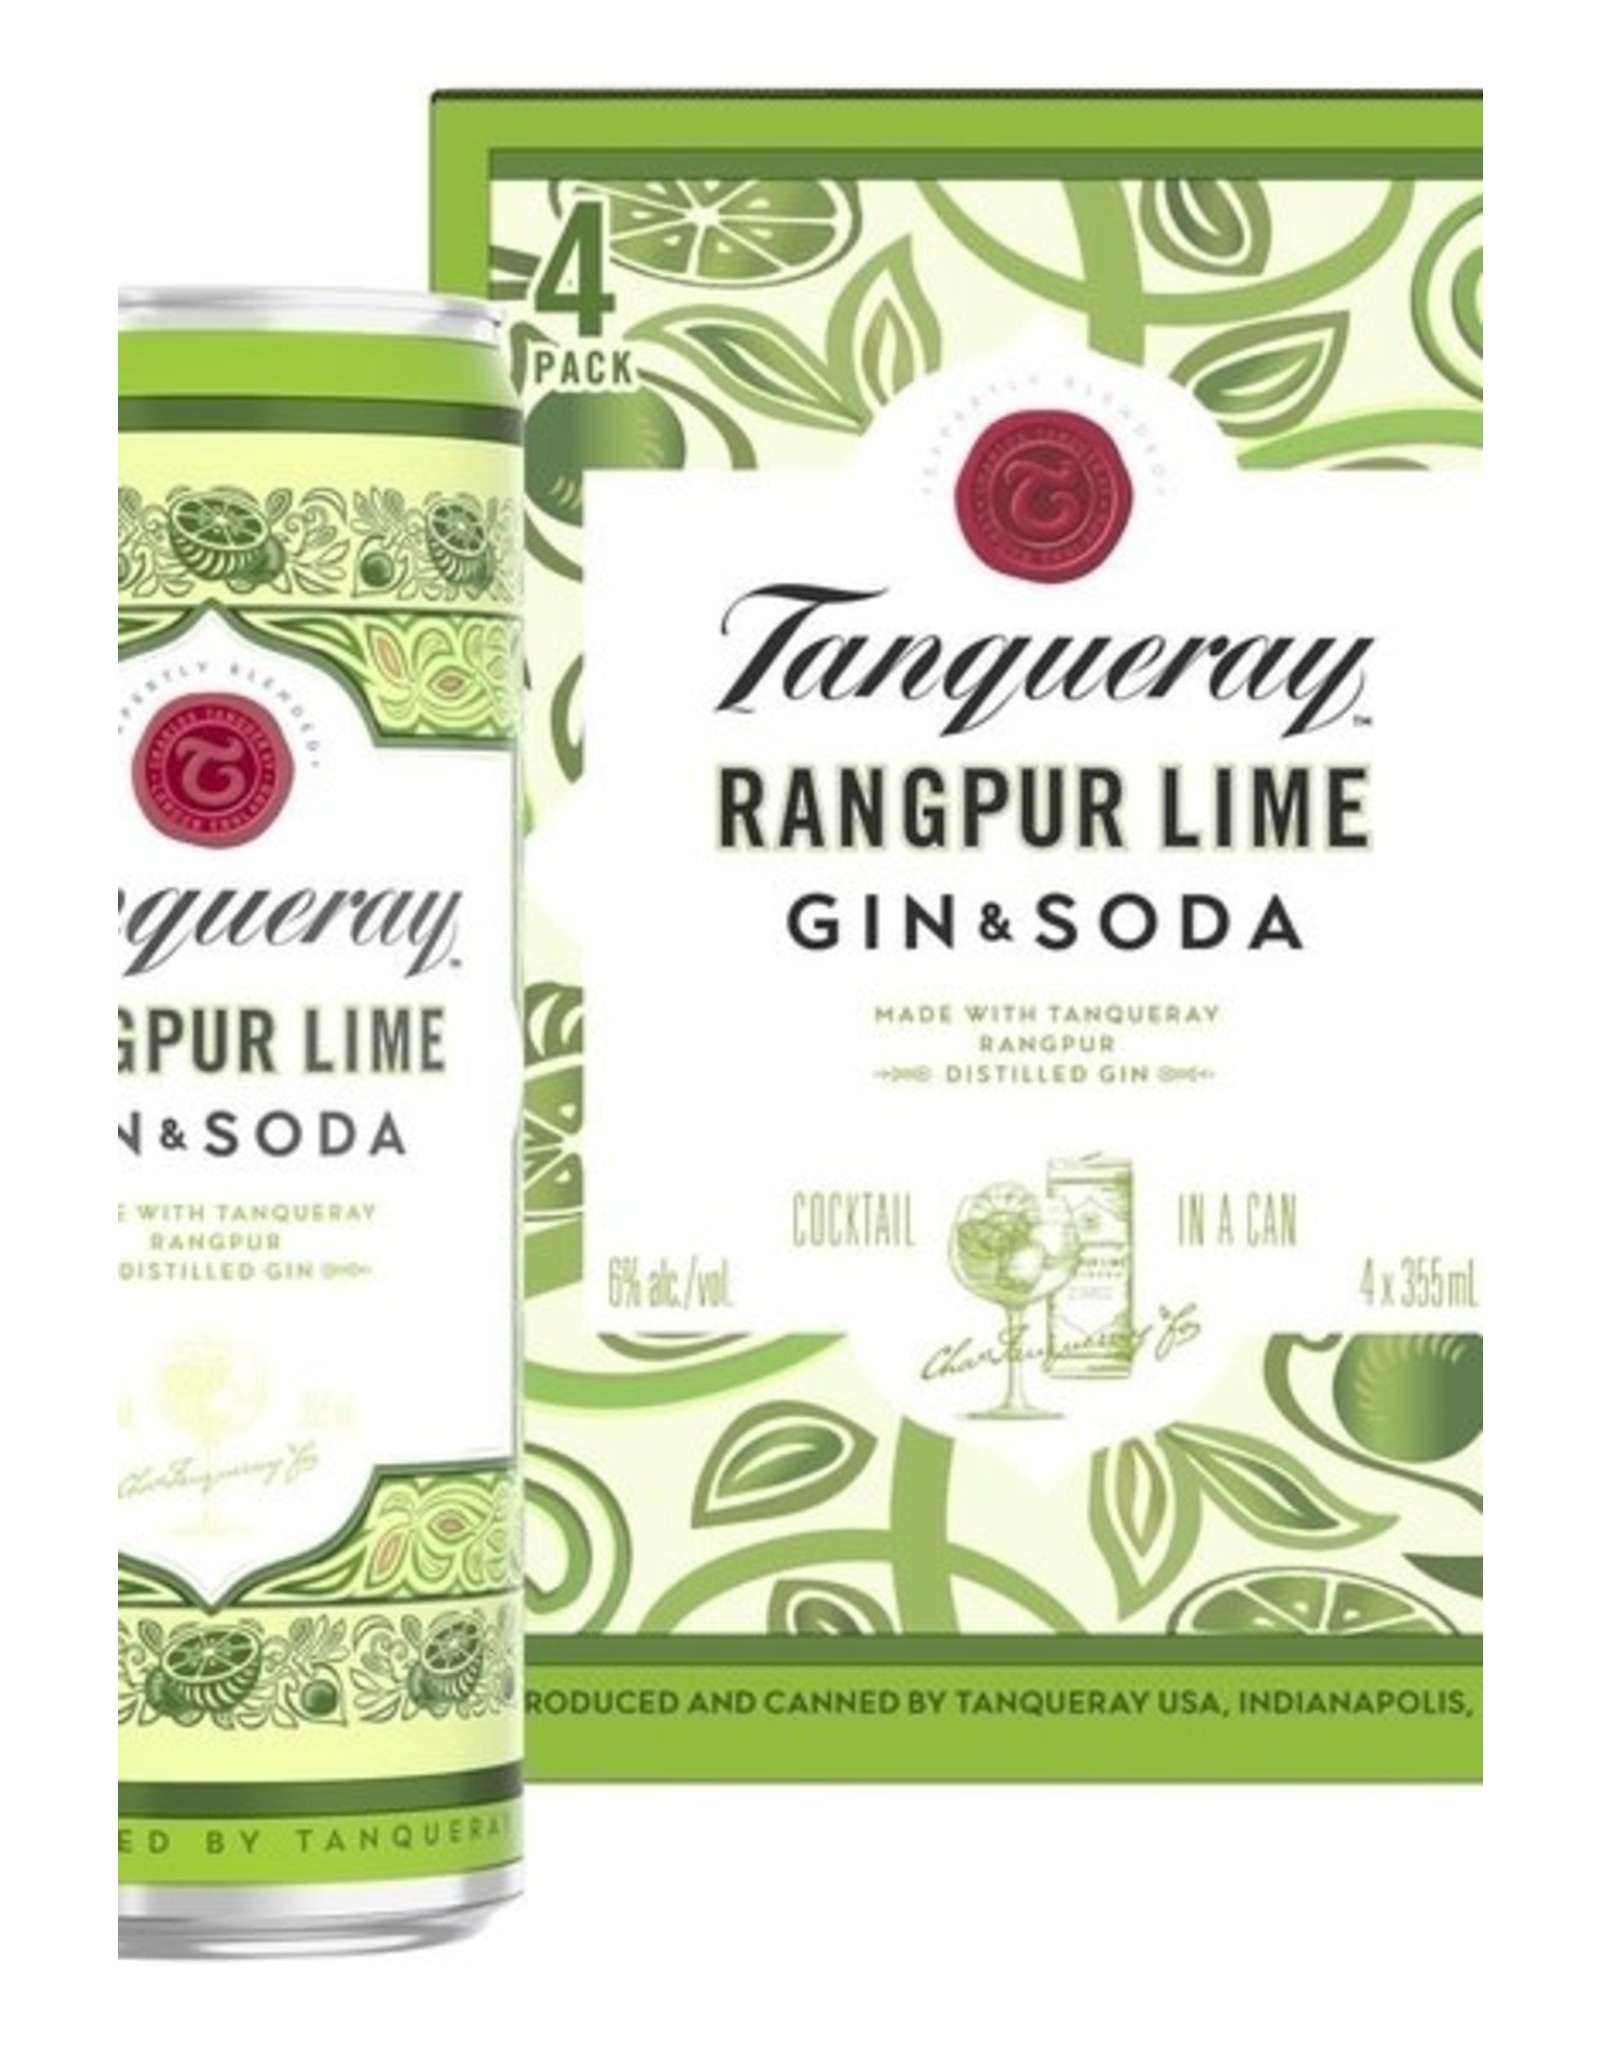 Tanqueray Gin & Soda Rangpur Lime 4 pack